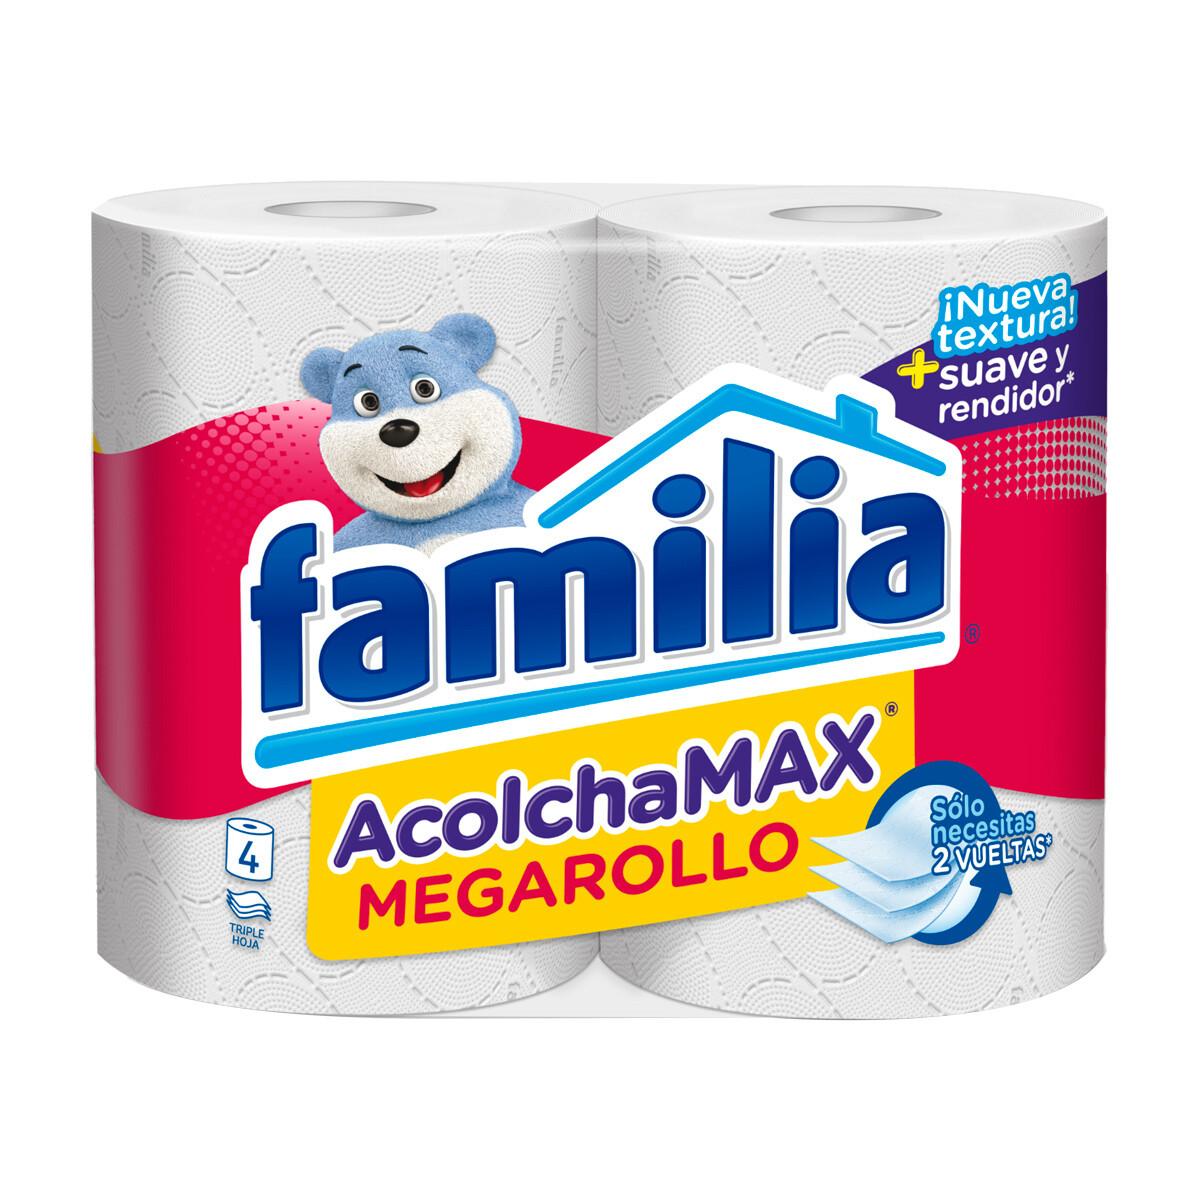 Papel Higiénico Familia Acolcha Max Mega Rollo